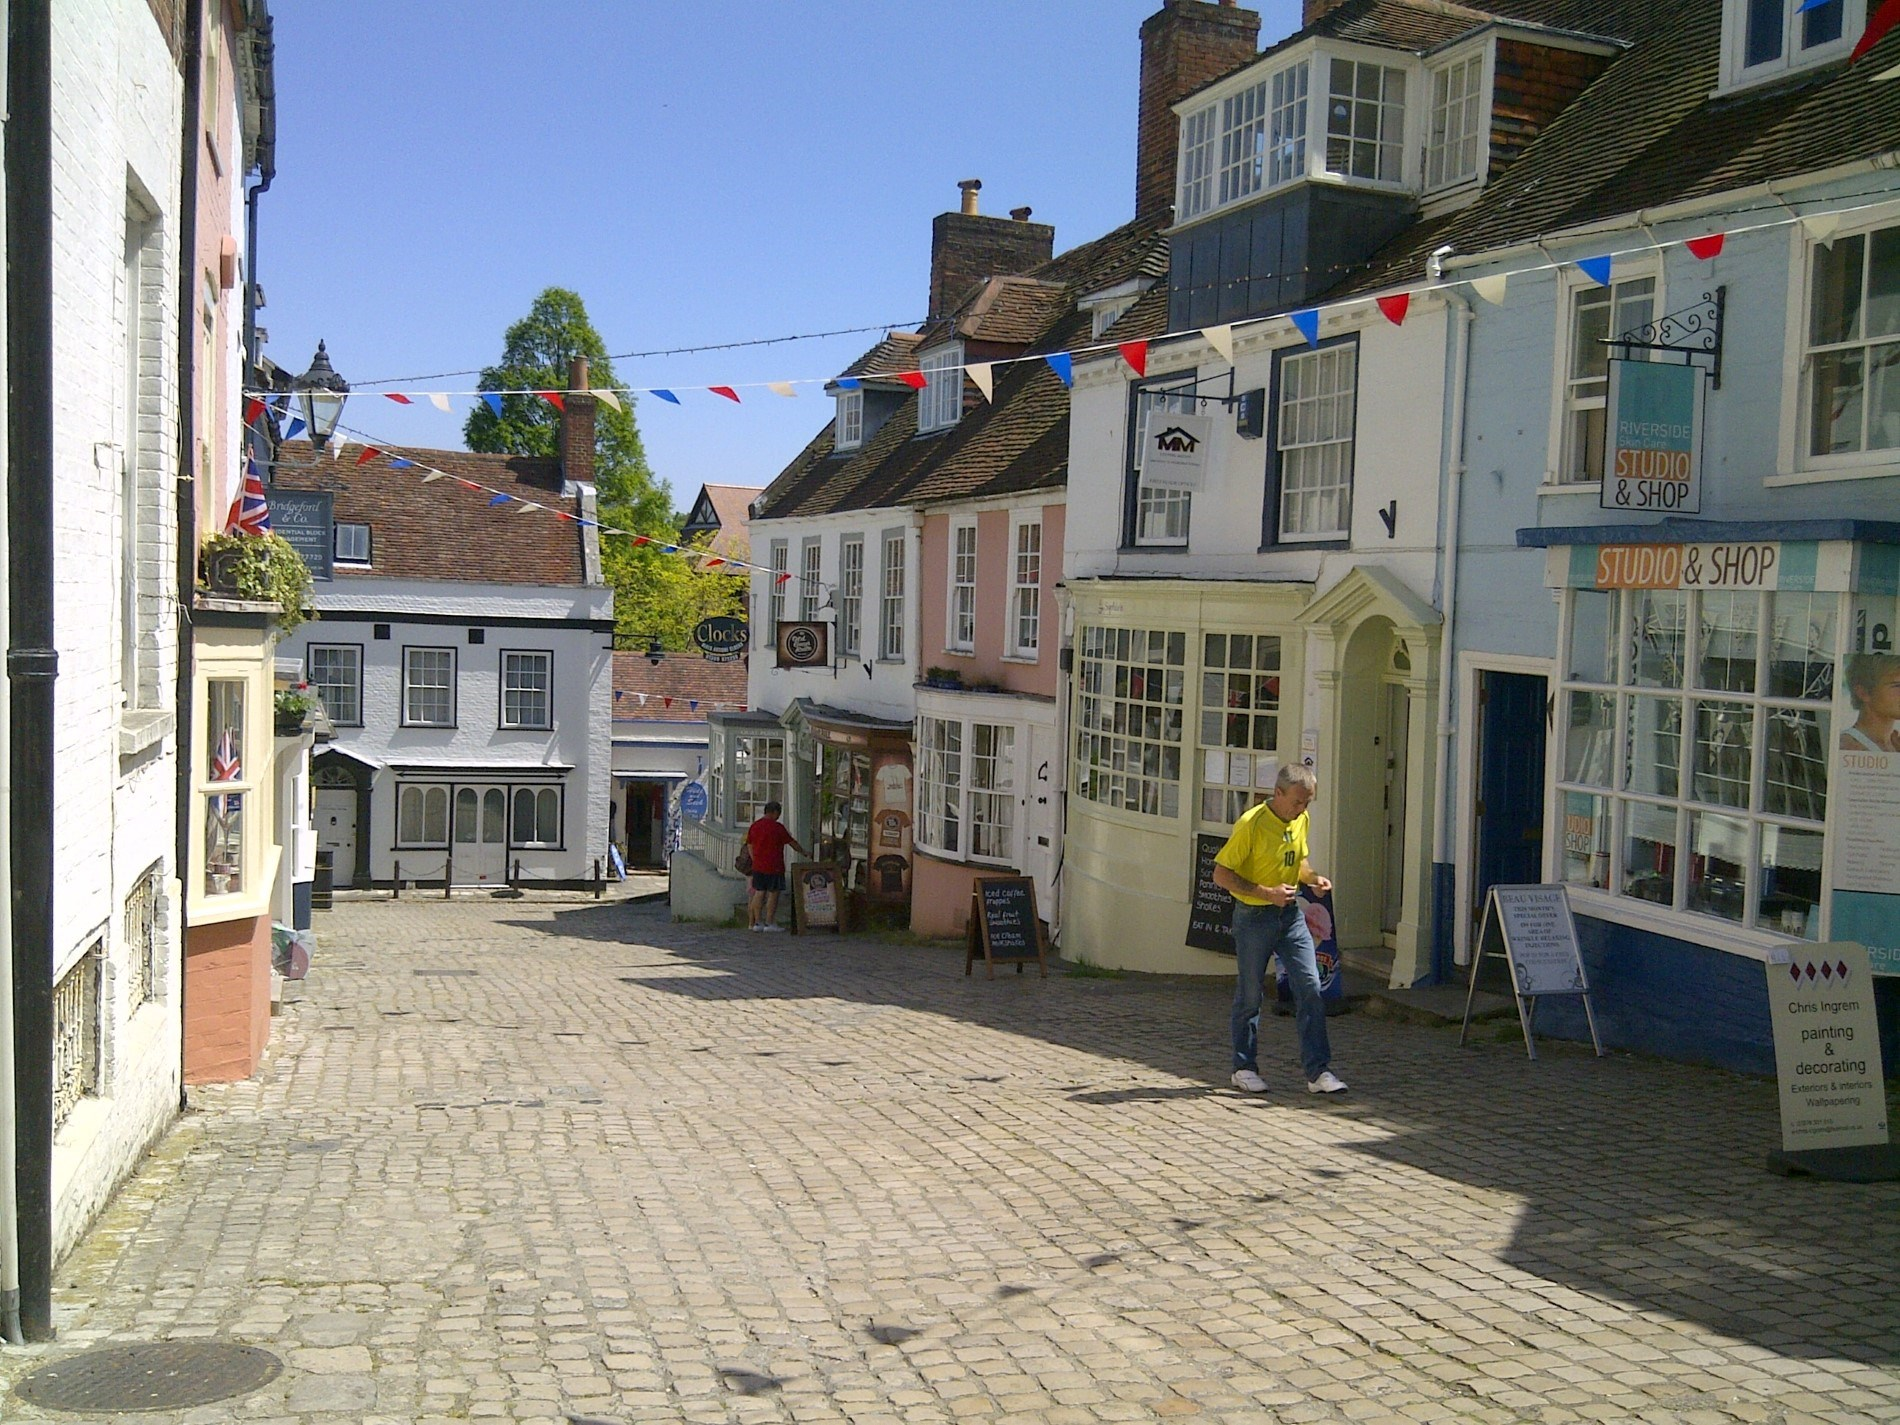 The cobbles in Lymington